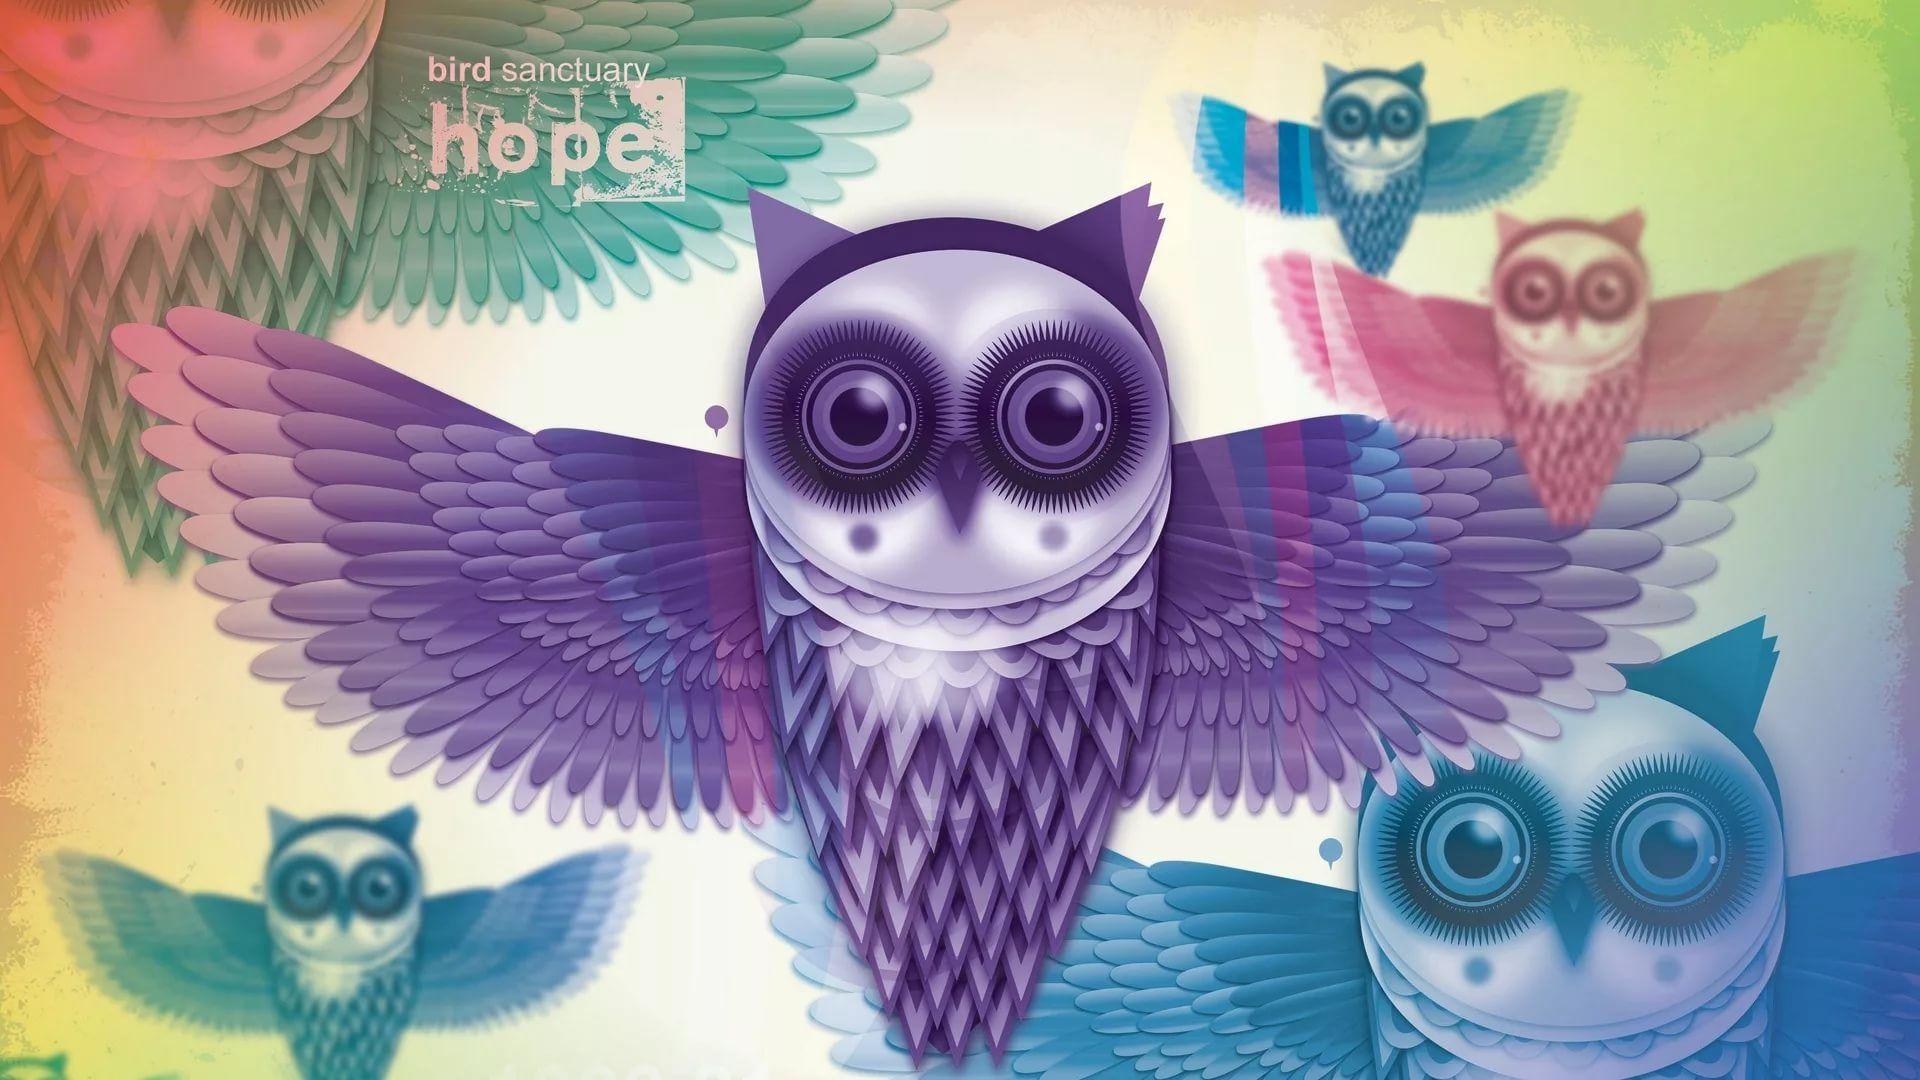 Cute Owl wallpaper image